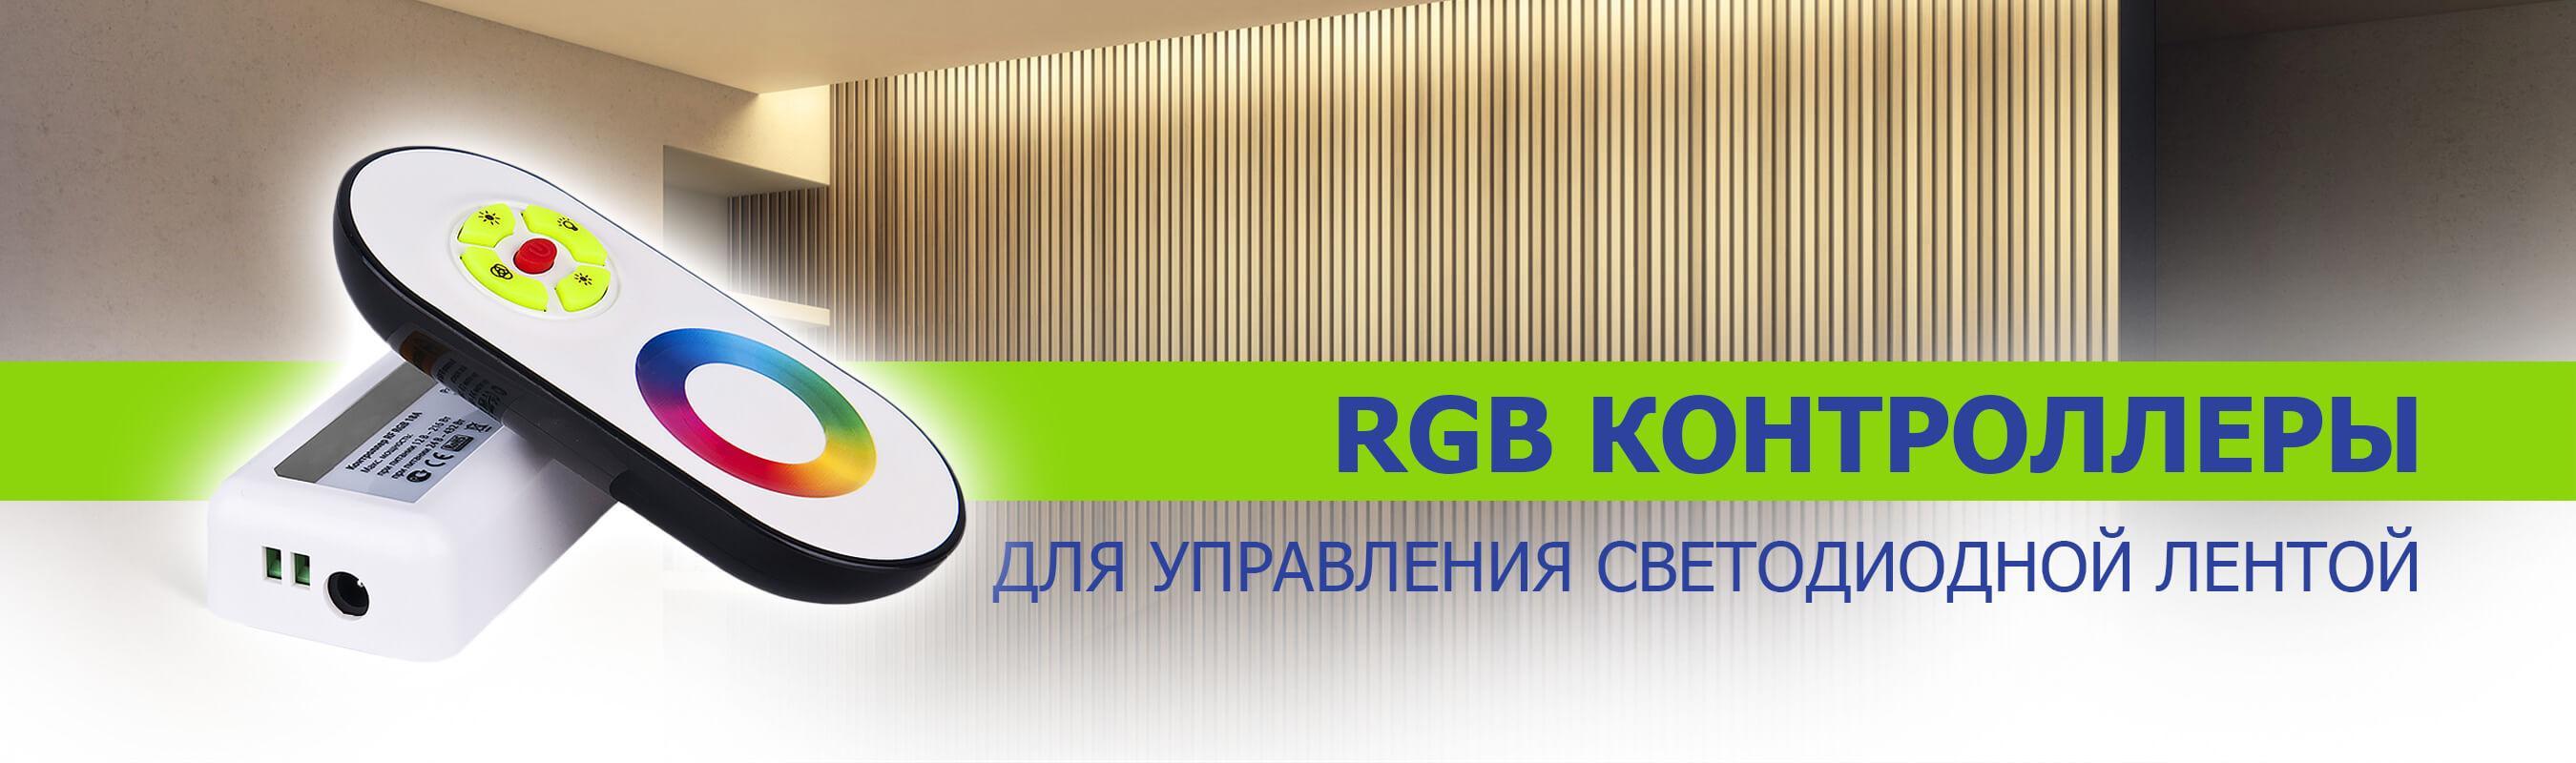 RGB контроллеры